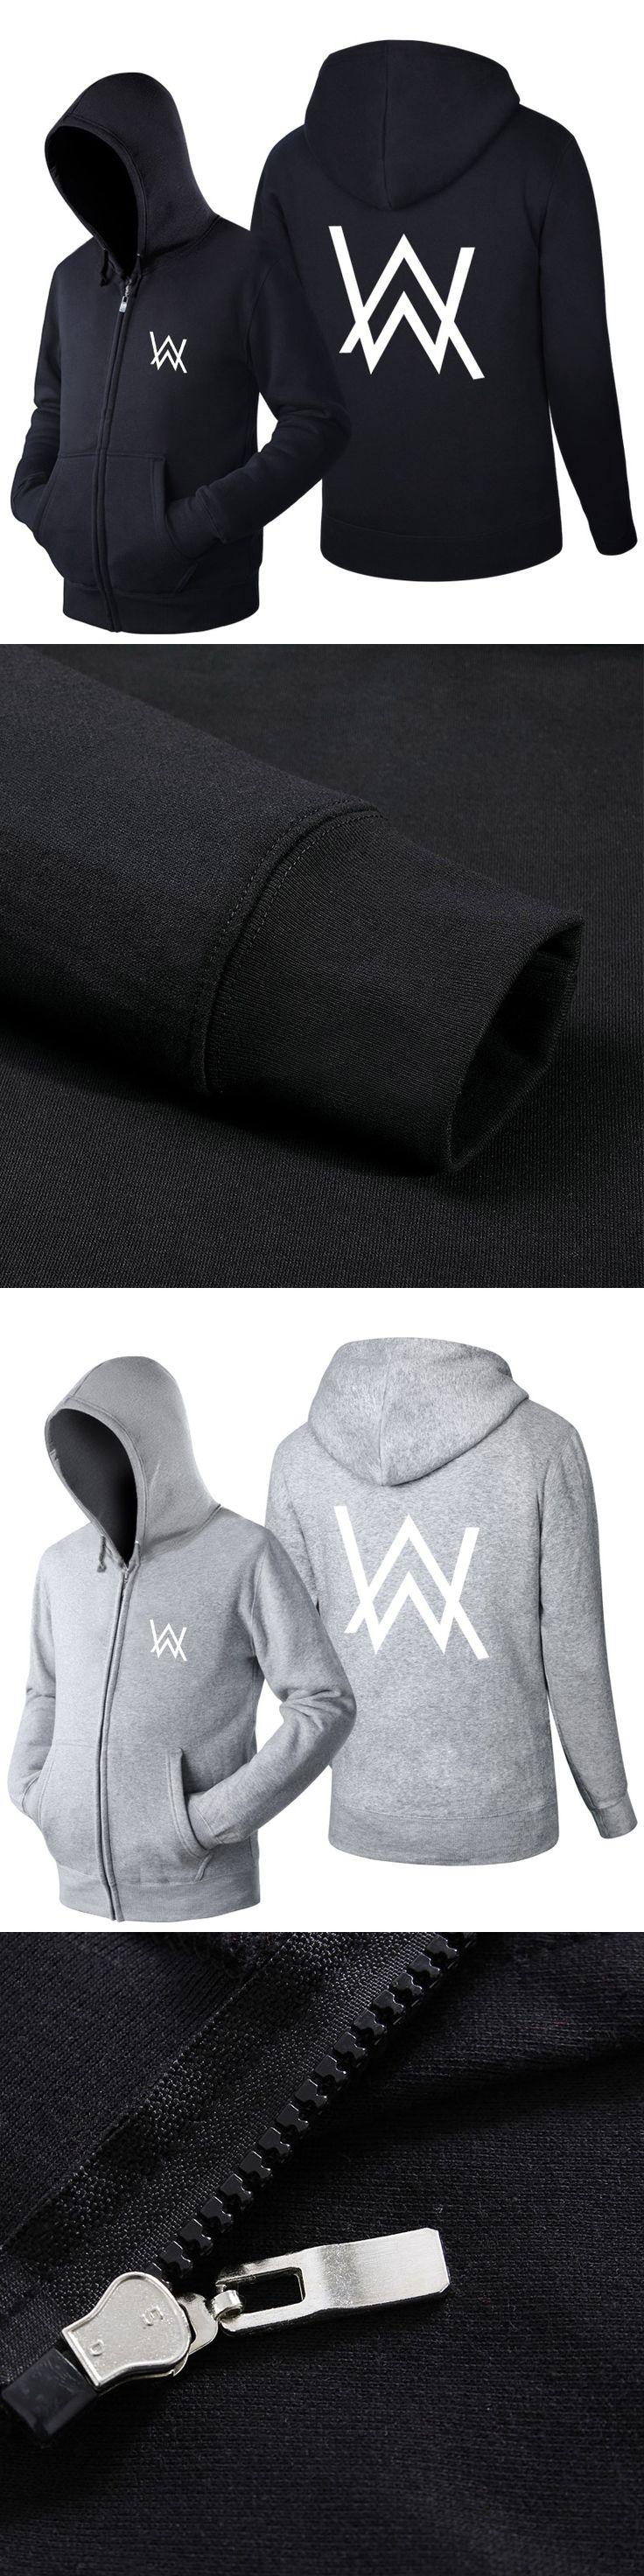 The 955 Best Alan Walker Images On Pinterest Dj And Jaket Sweater Zipper New Arrival Mens Hoodies Jacket Hoodie Fading Msuic Springautumn Us Eu Plus